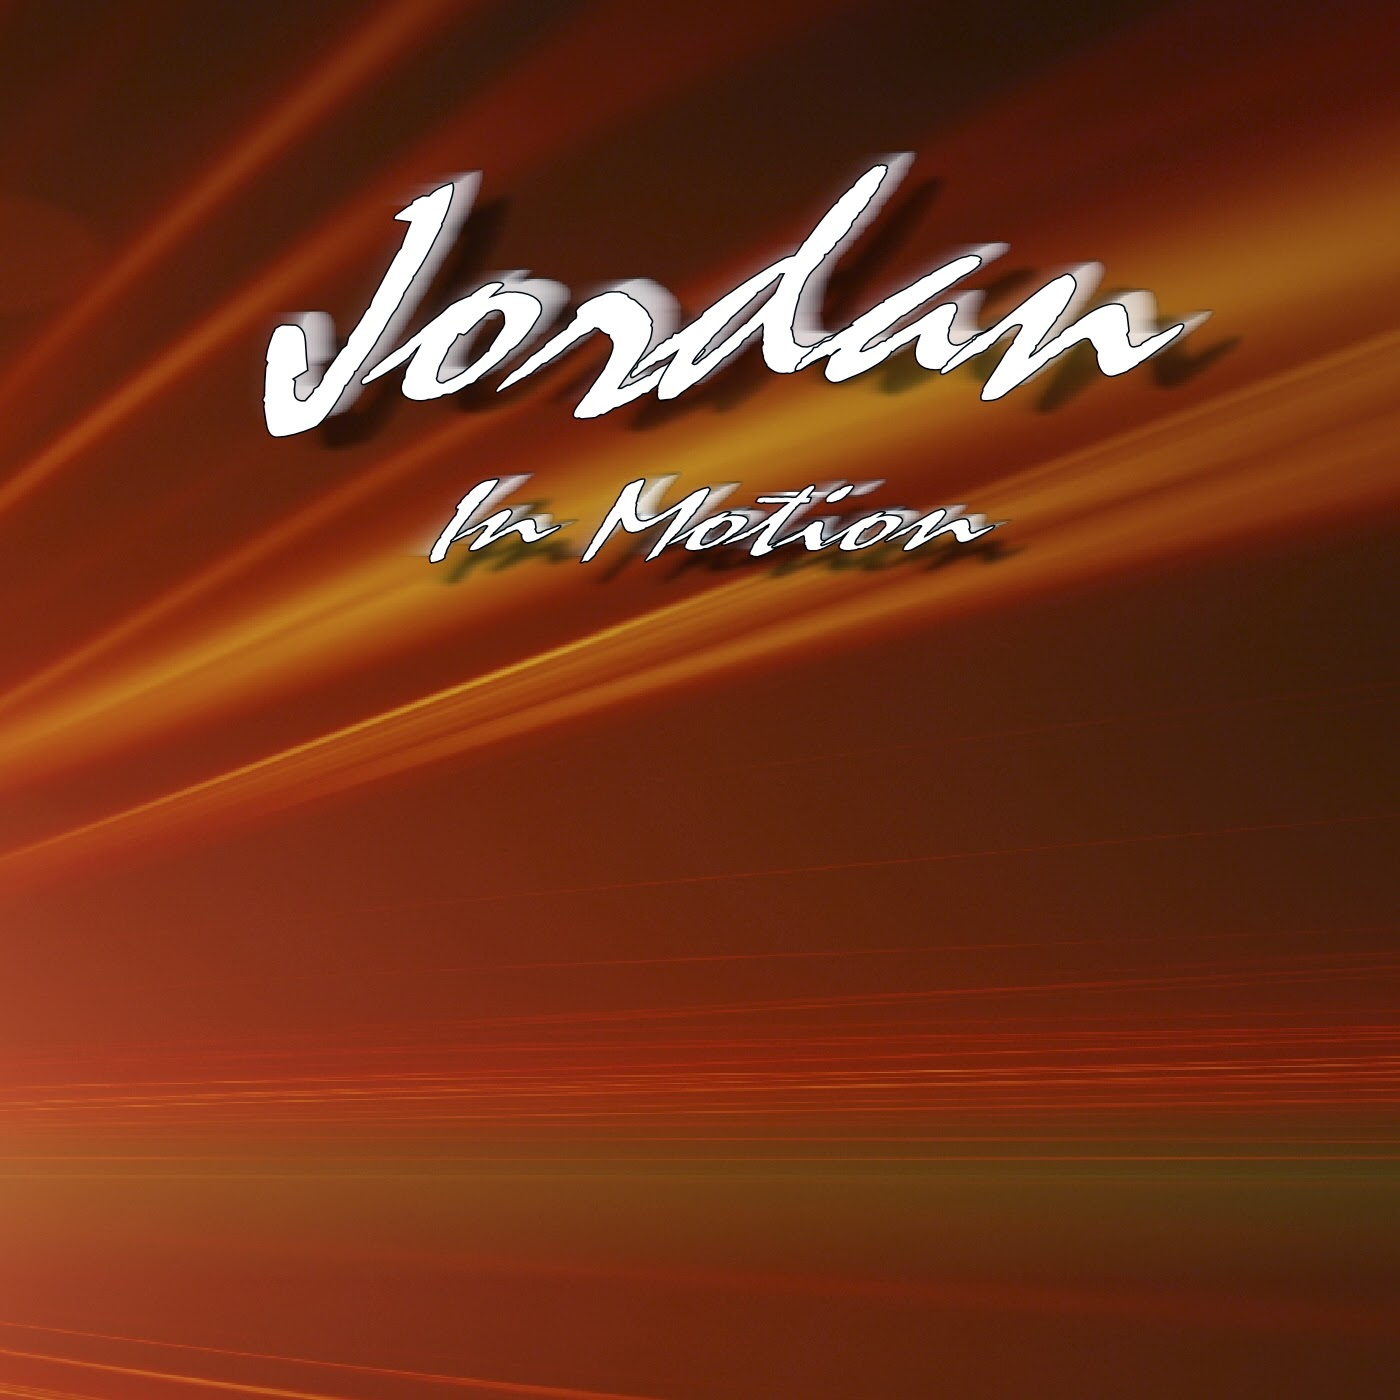 http://www.cdbaby.com/jordan132